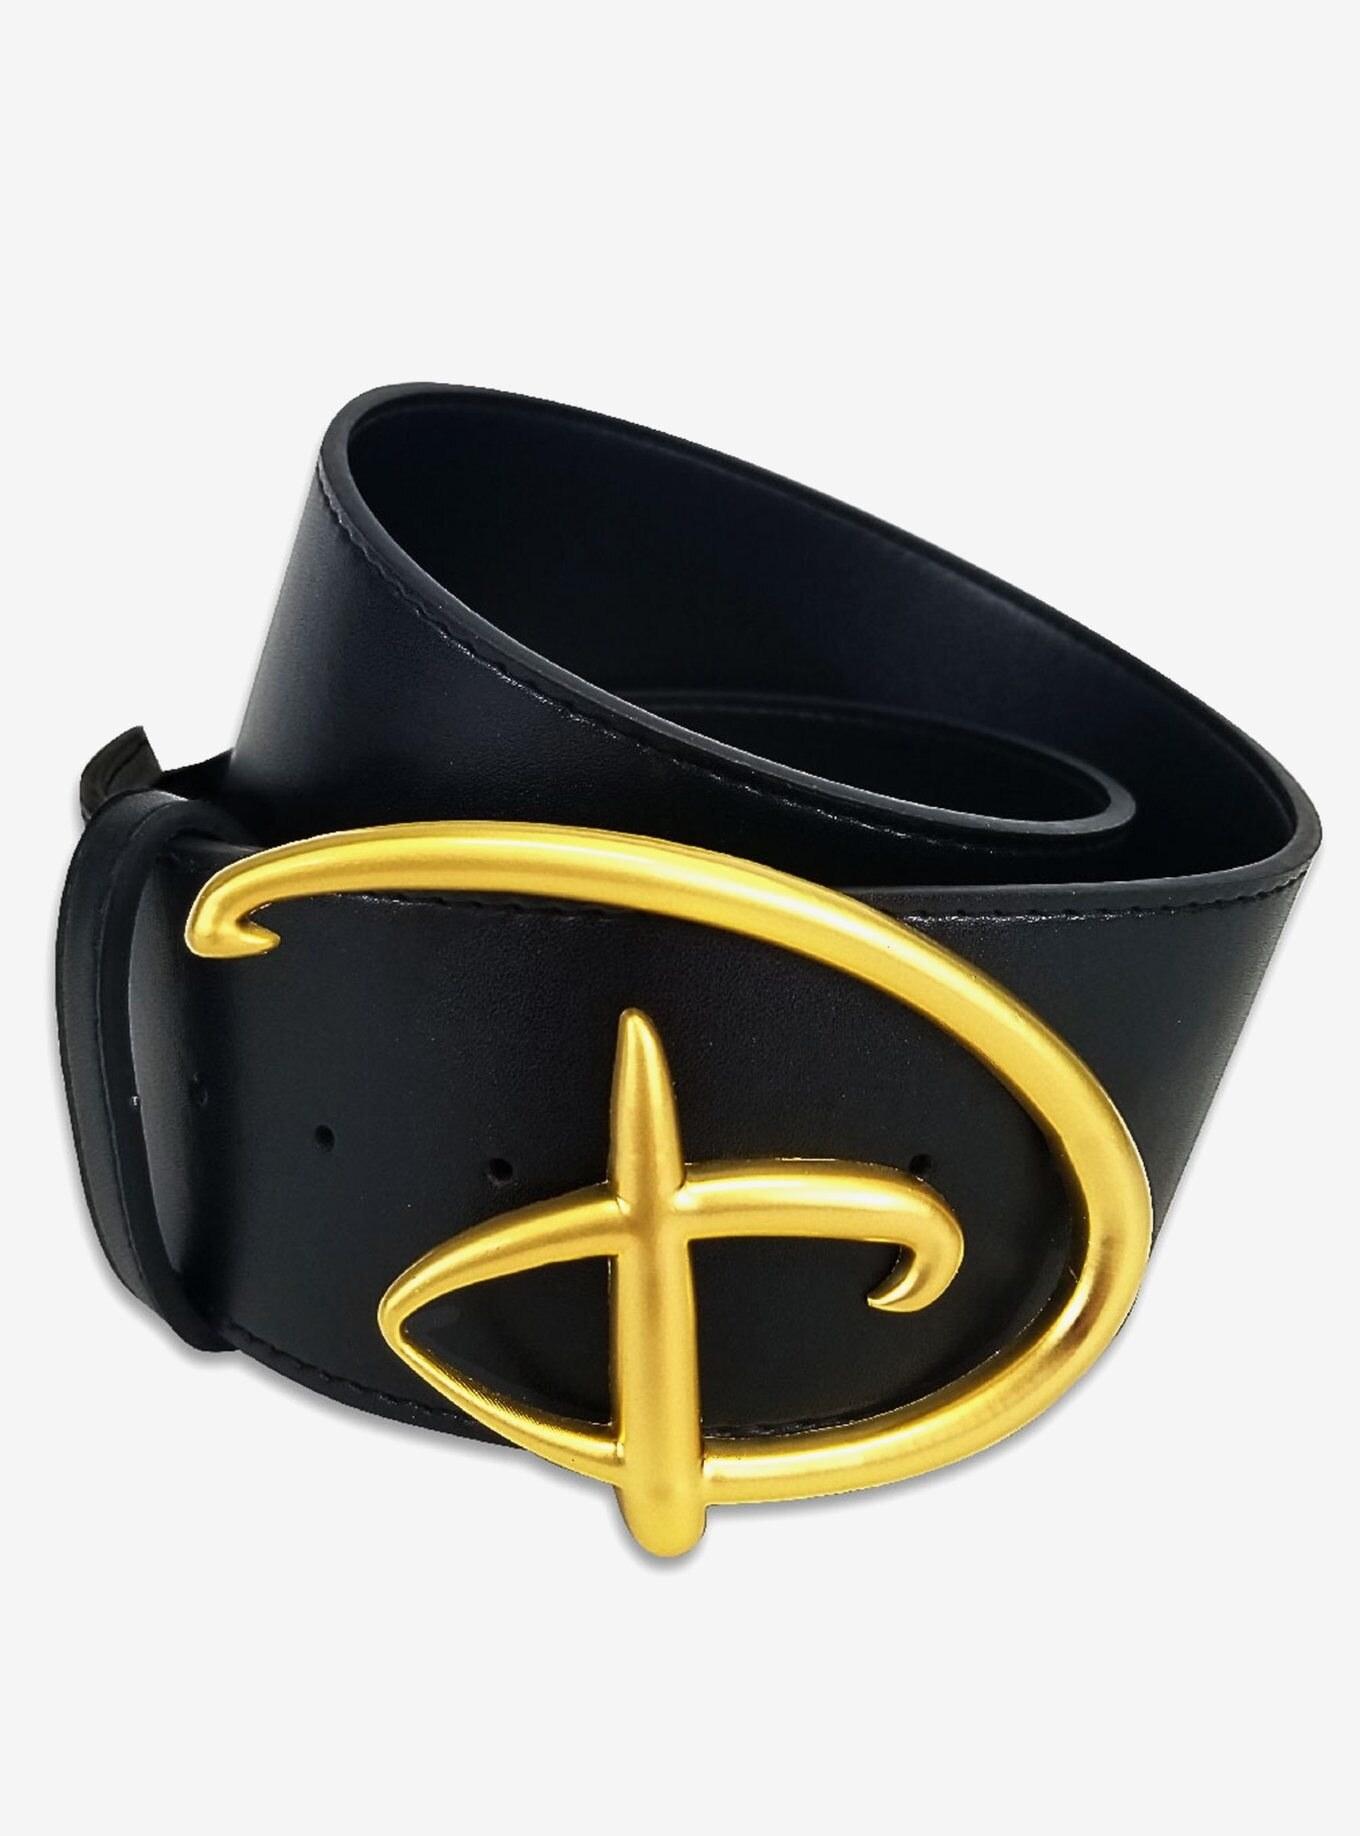 belt with disney style D belt buckle